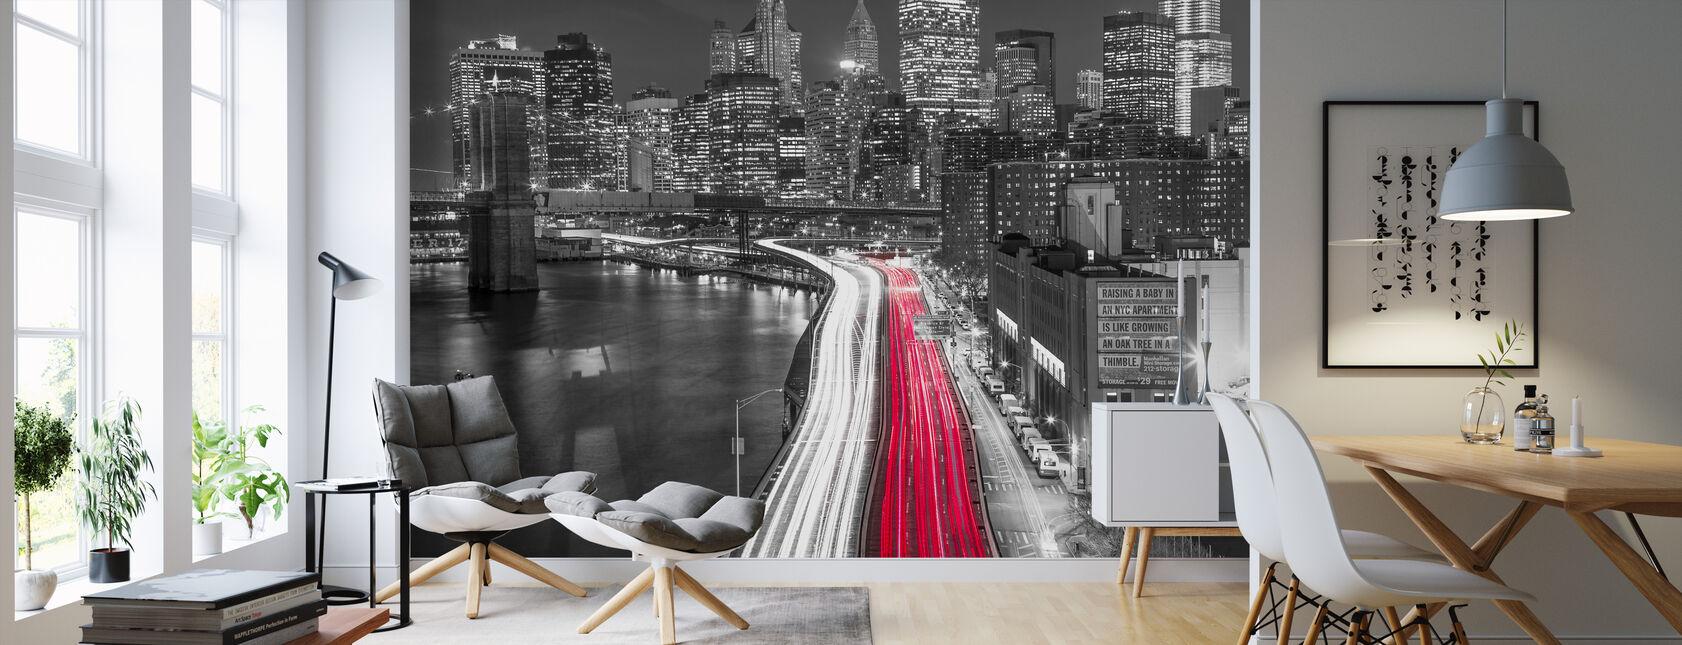 New York City Movement - Bw - Wallpaper - Living Room